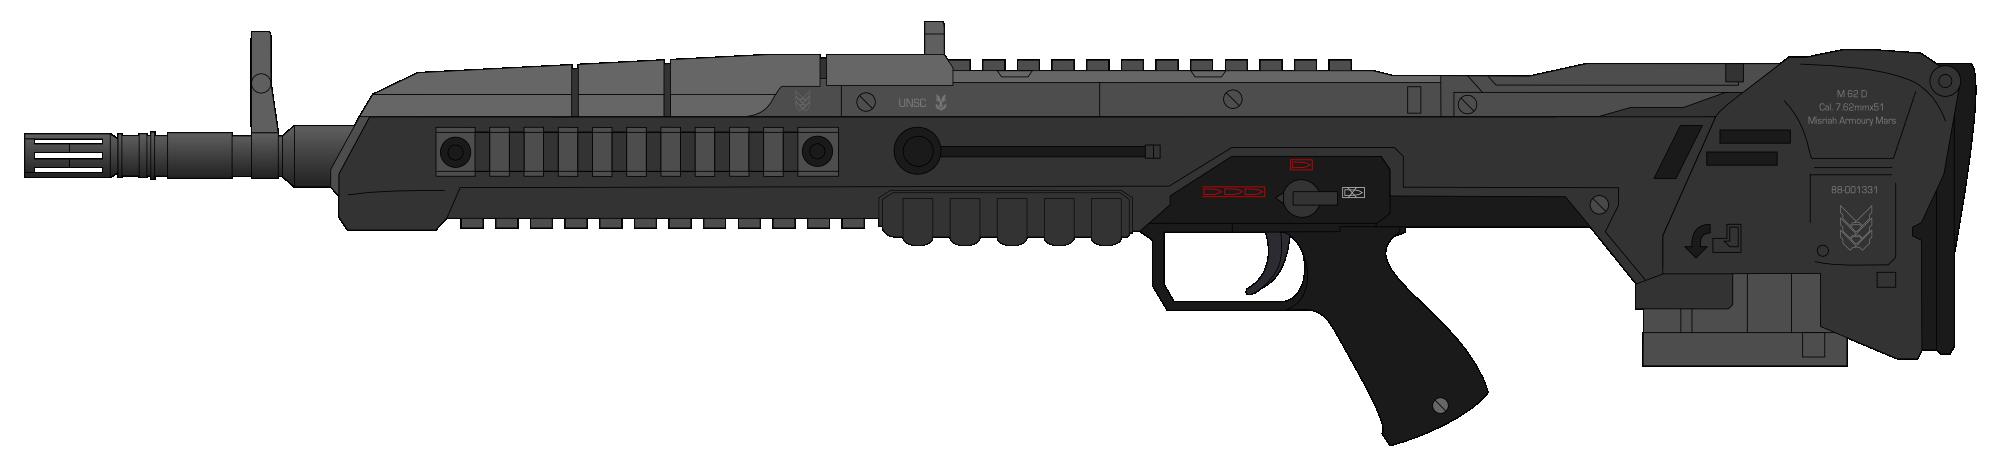 M62 light machine gun